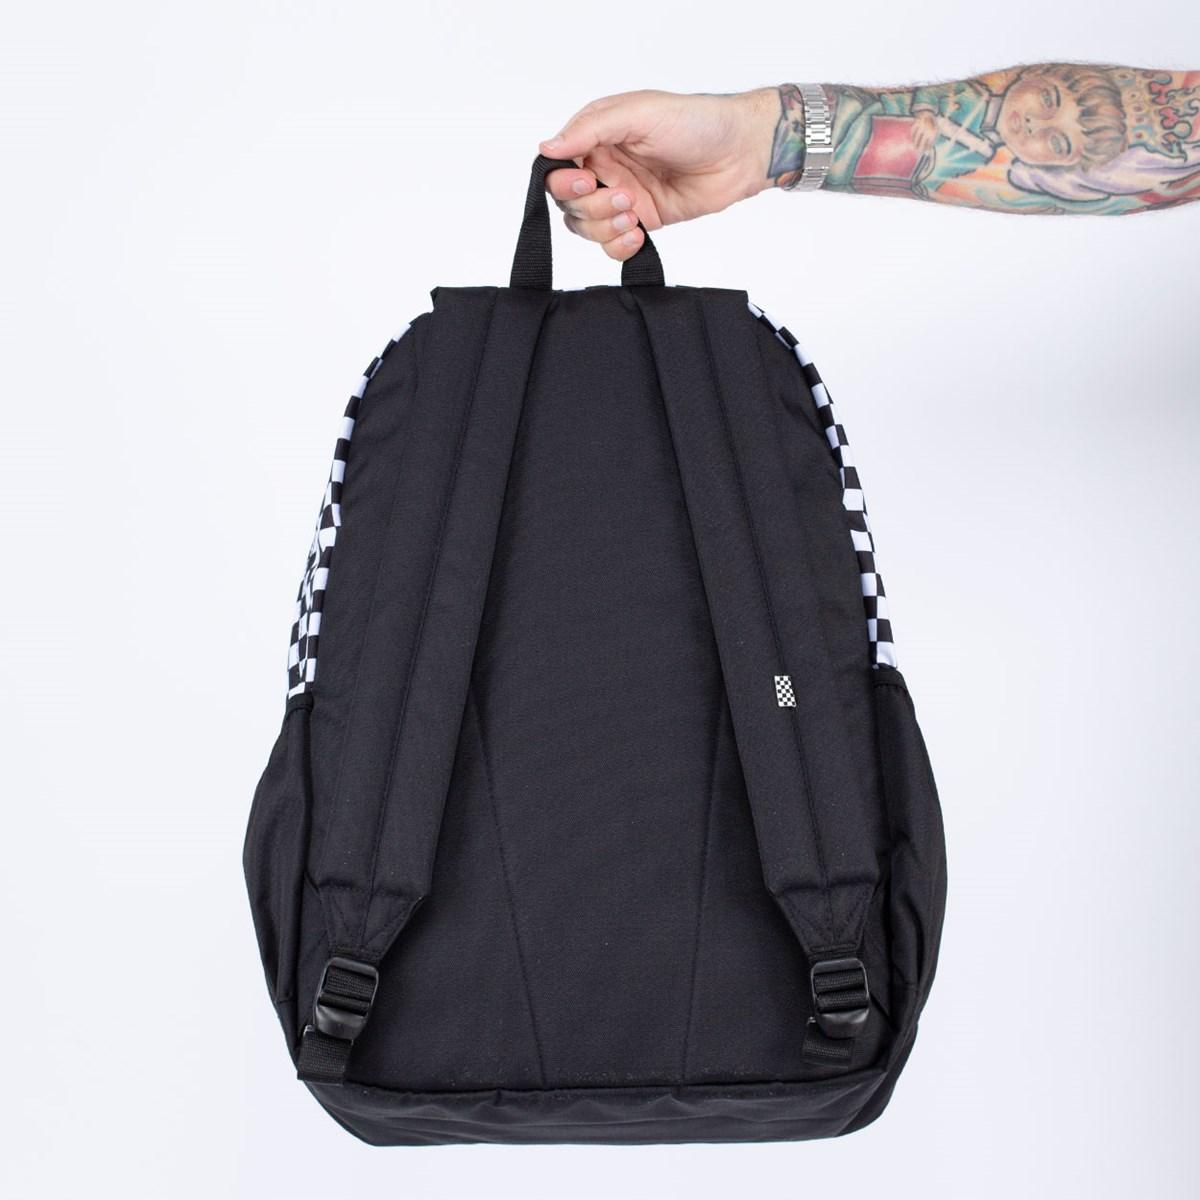 Mochila Vans WM Sporty Realm Plus Backpack Black Sport Stripe VN0A3PBIV45